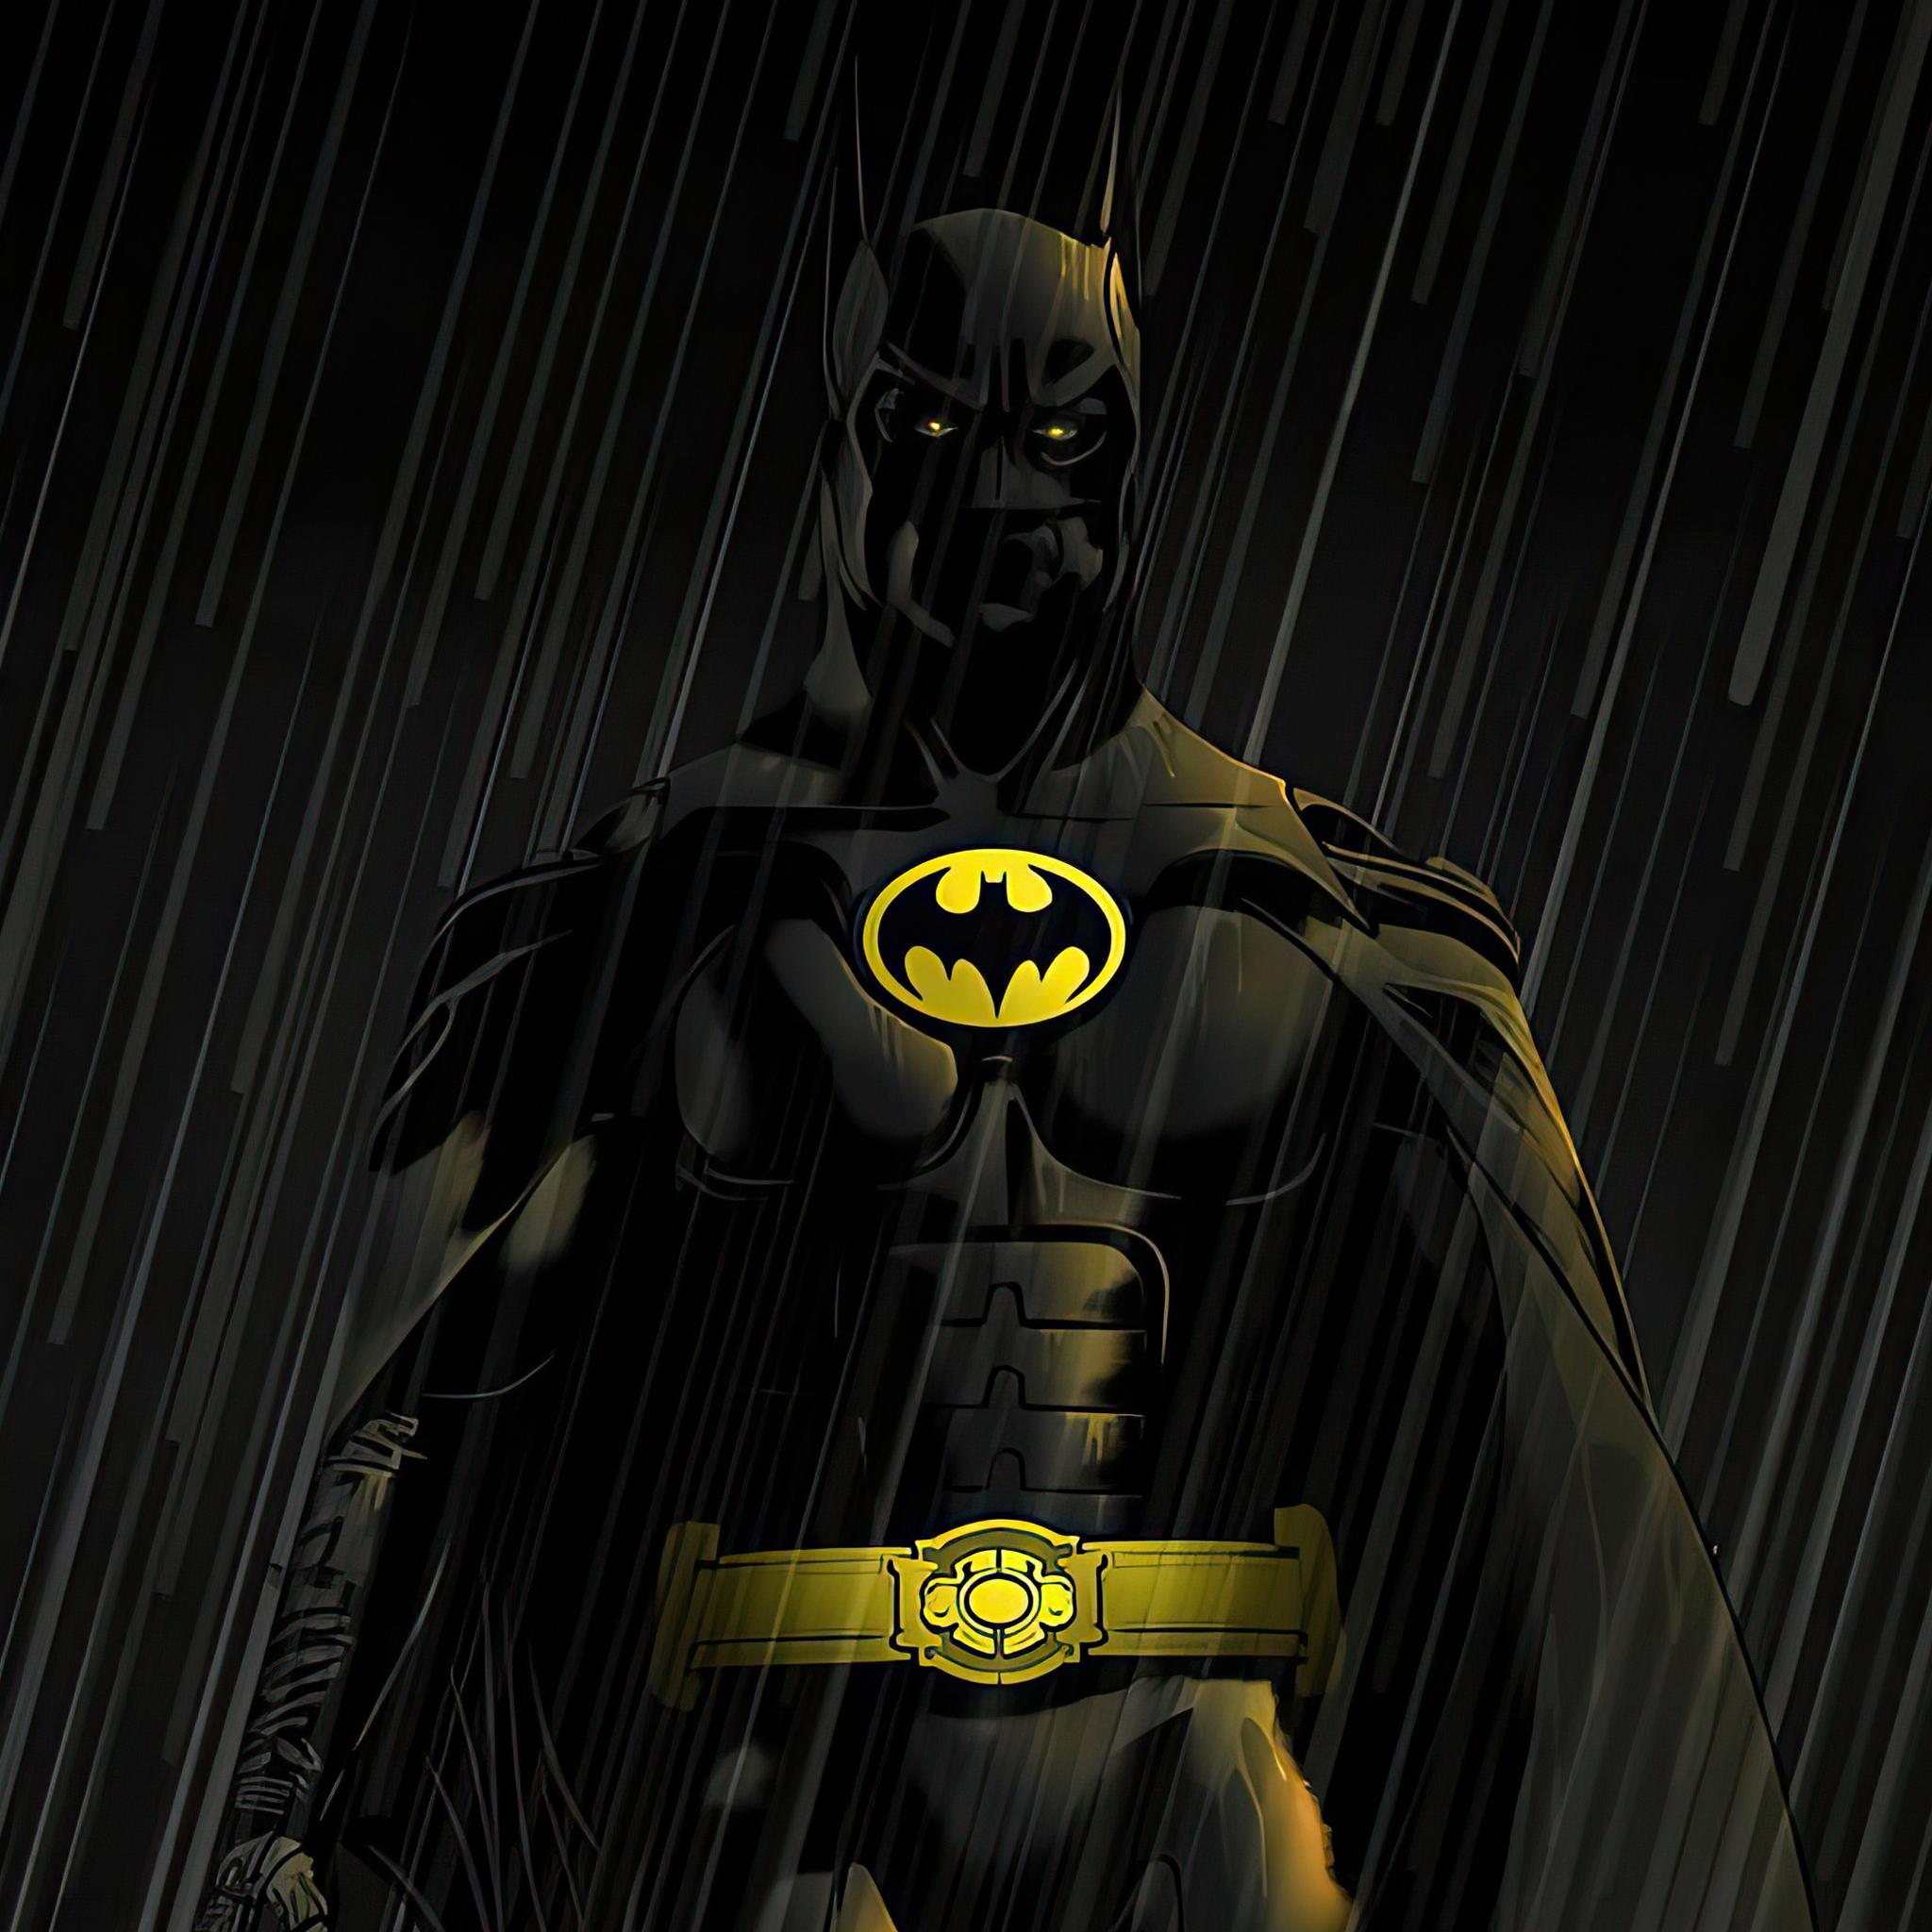 2048x2048 Batman Dark 4k 2020 Ipad Air HD 4k Wallpapers ...